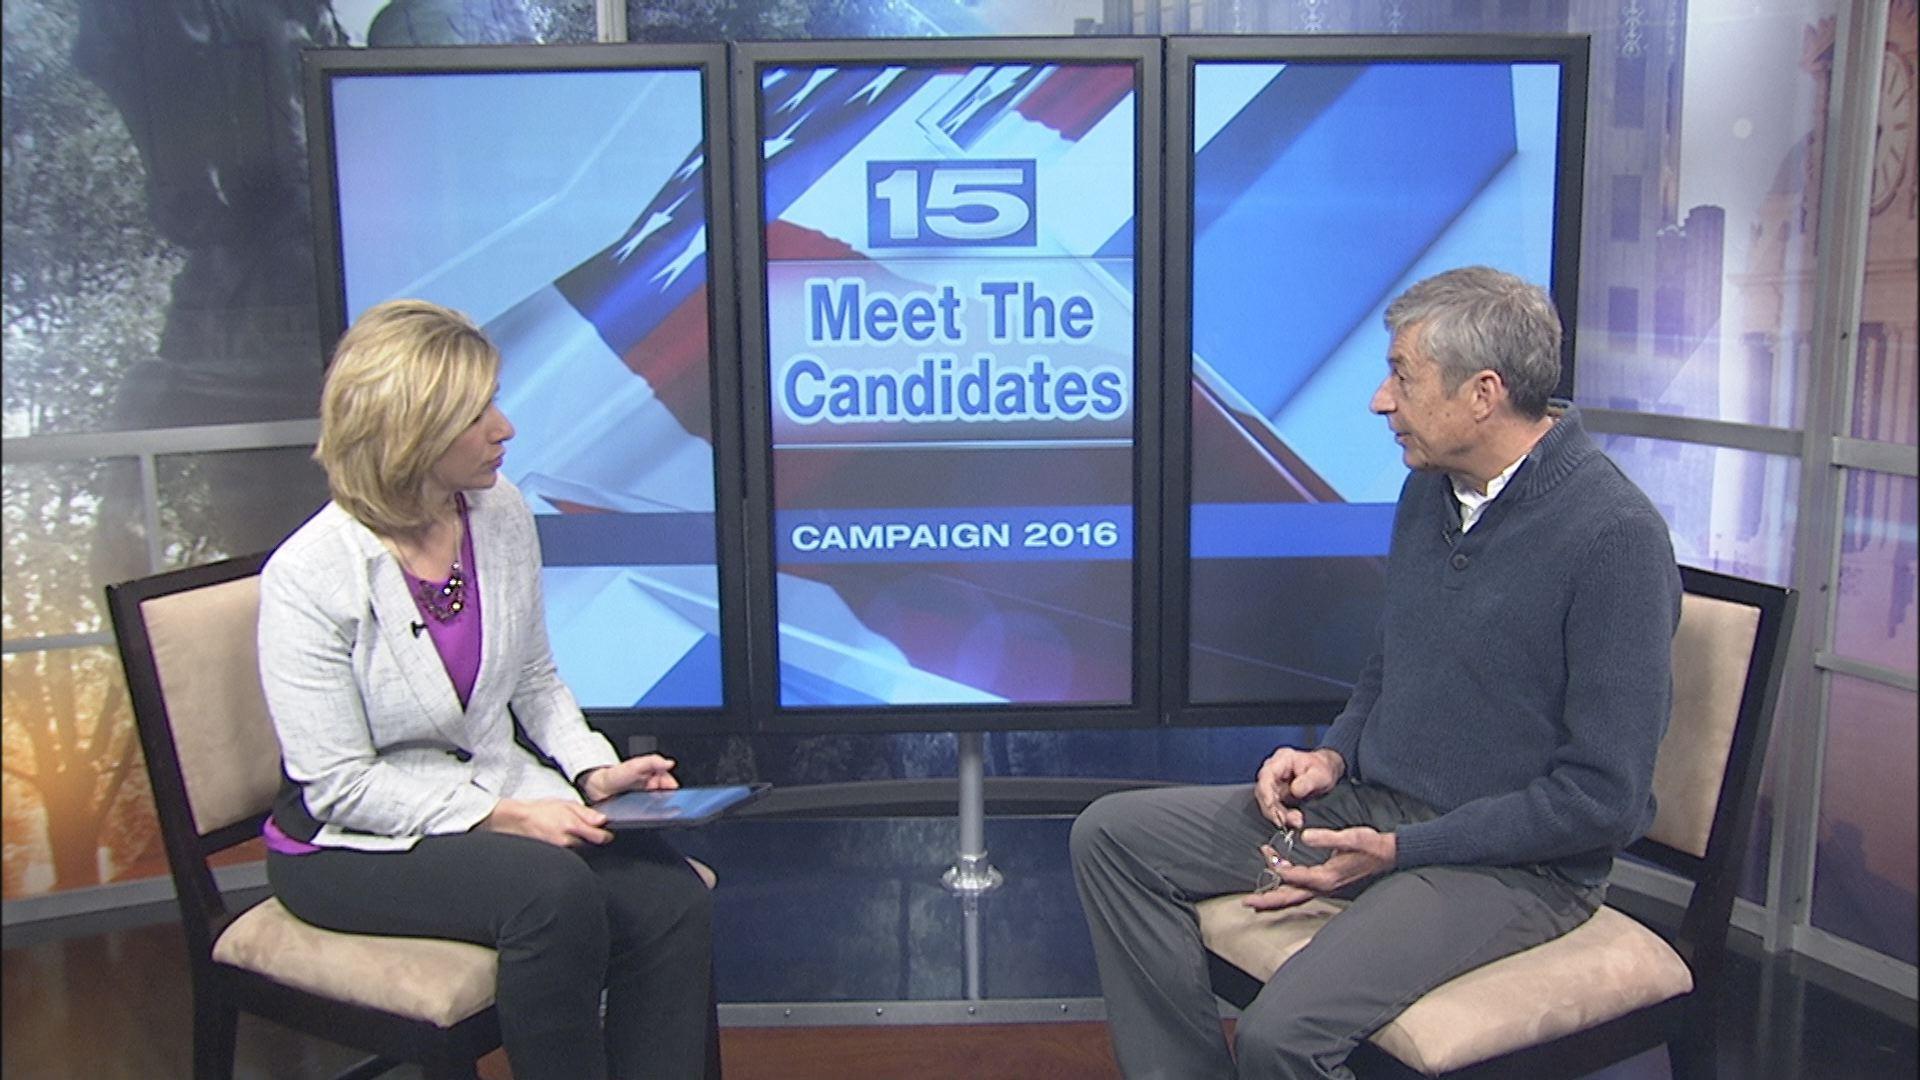 Meet The Candidates Mark Baringer